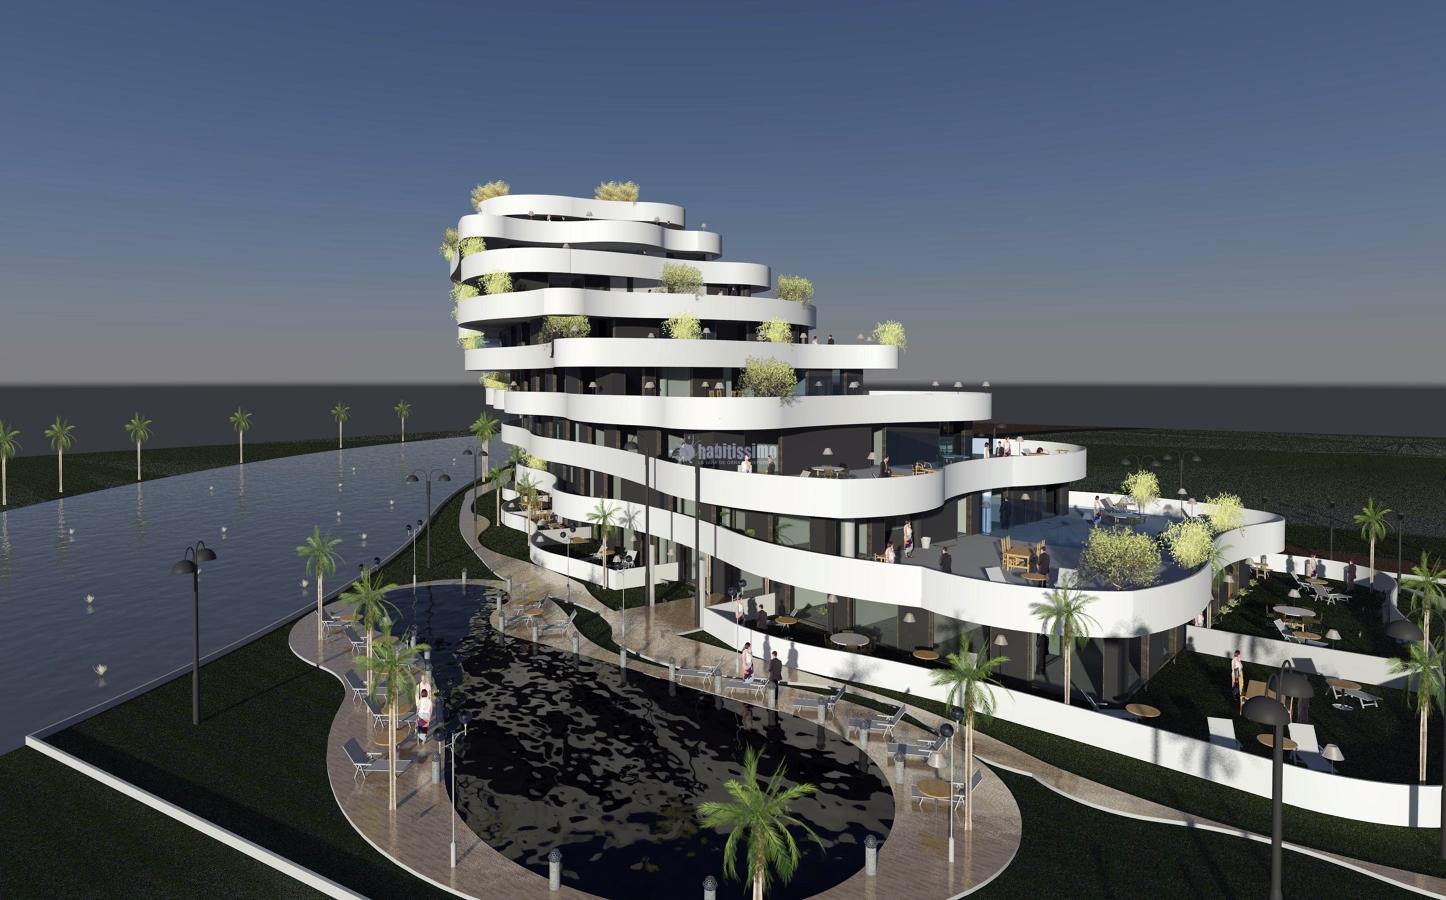 Foto edificio residencial en al zorah ajman emiratos - Edificios minimalistas ...